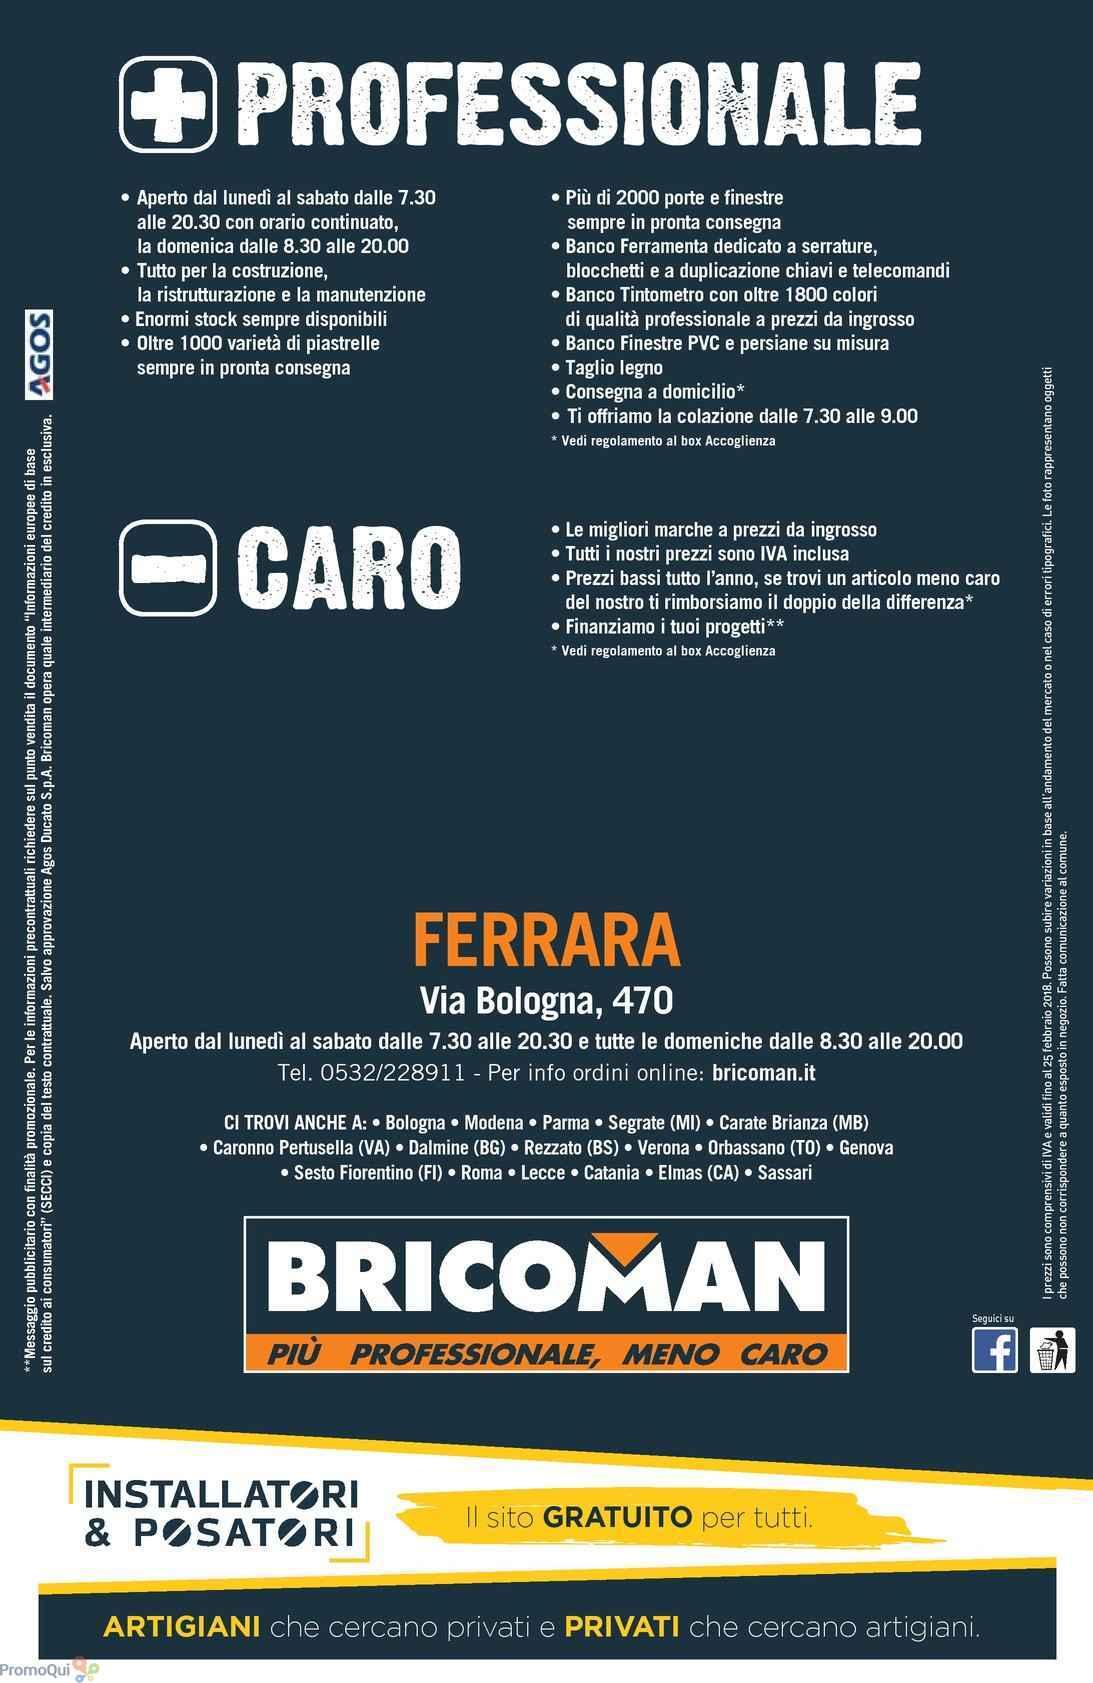 Bricoman piastrelle gallery of bricoman orbassano for Catalogo bricoman elmas